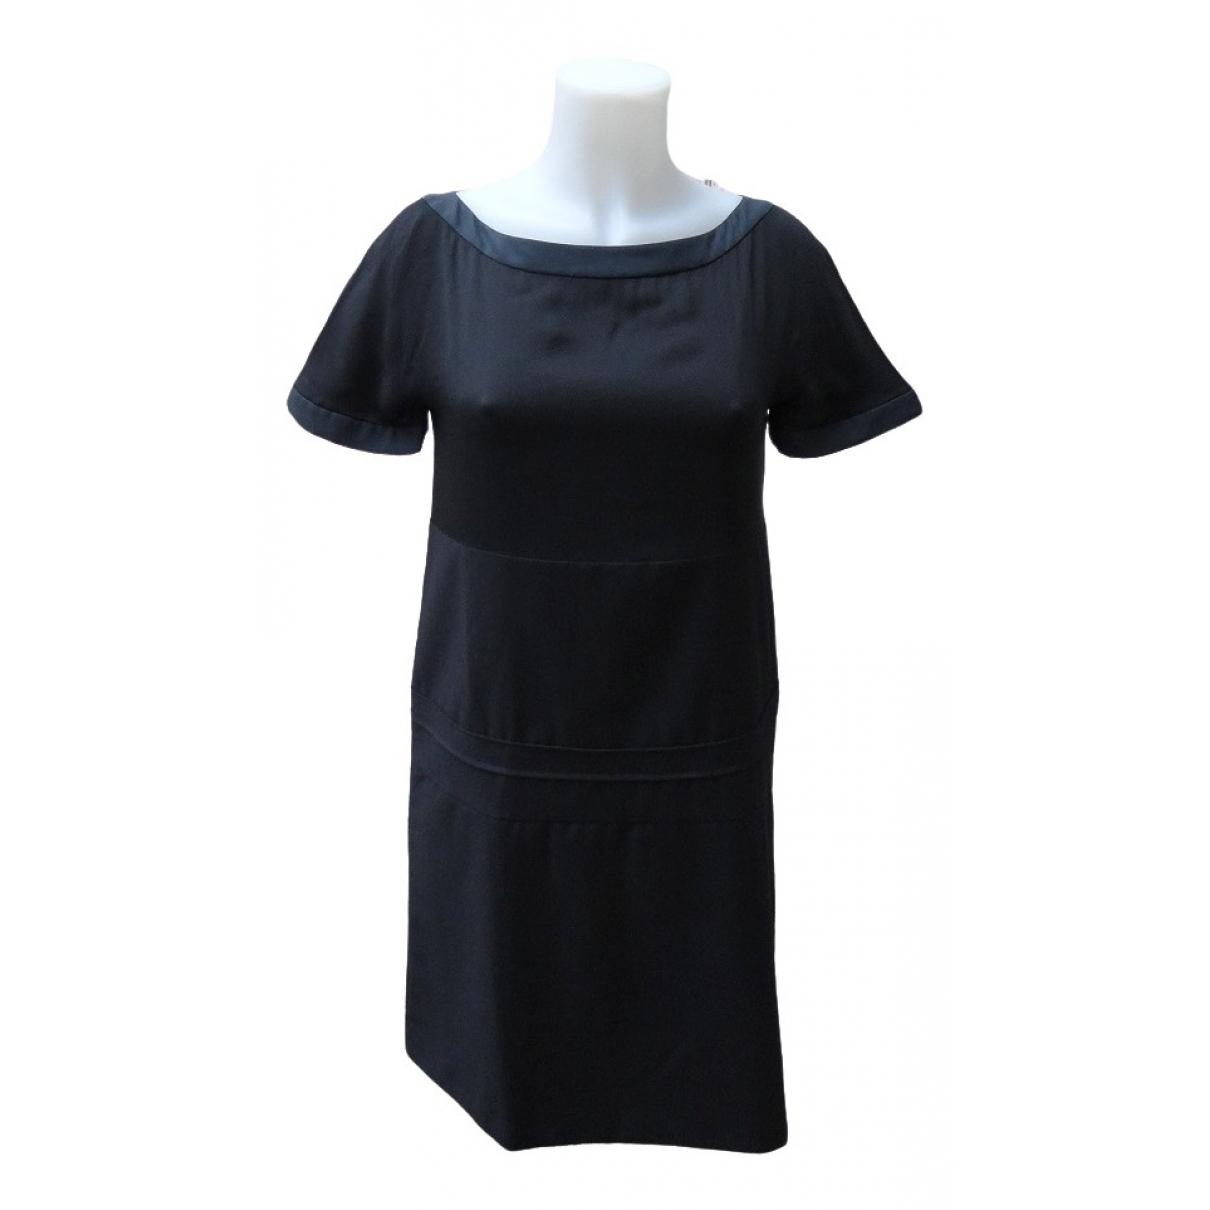 Chloé \N Black Silk dress for Women 34 FR